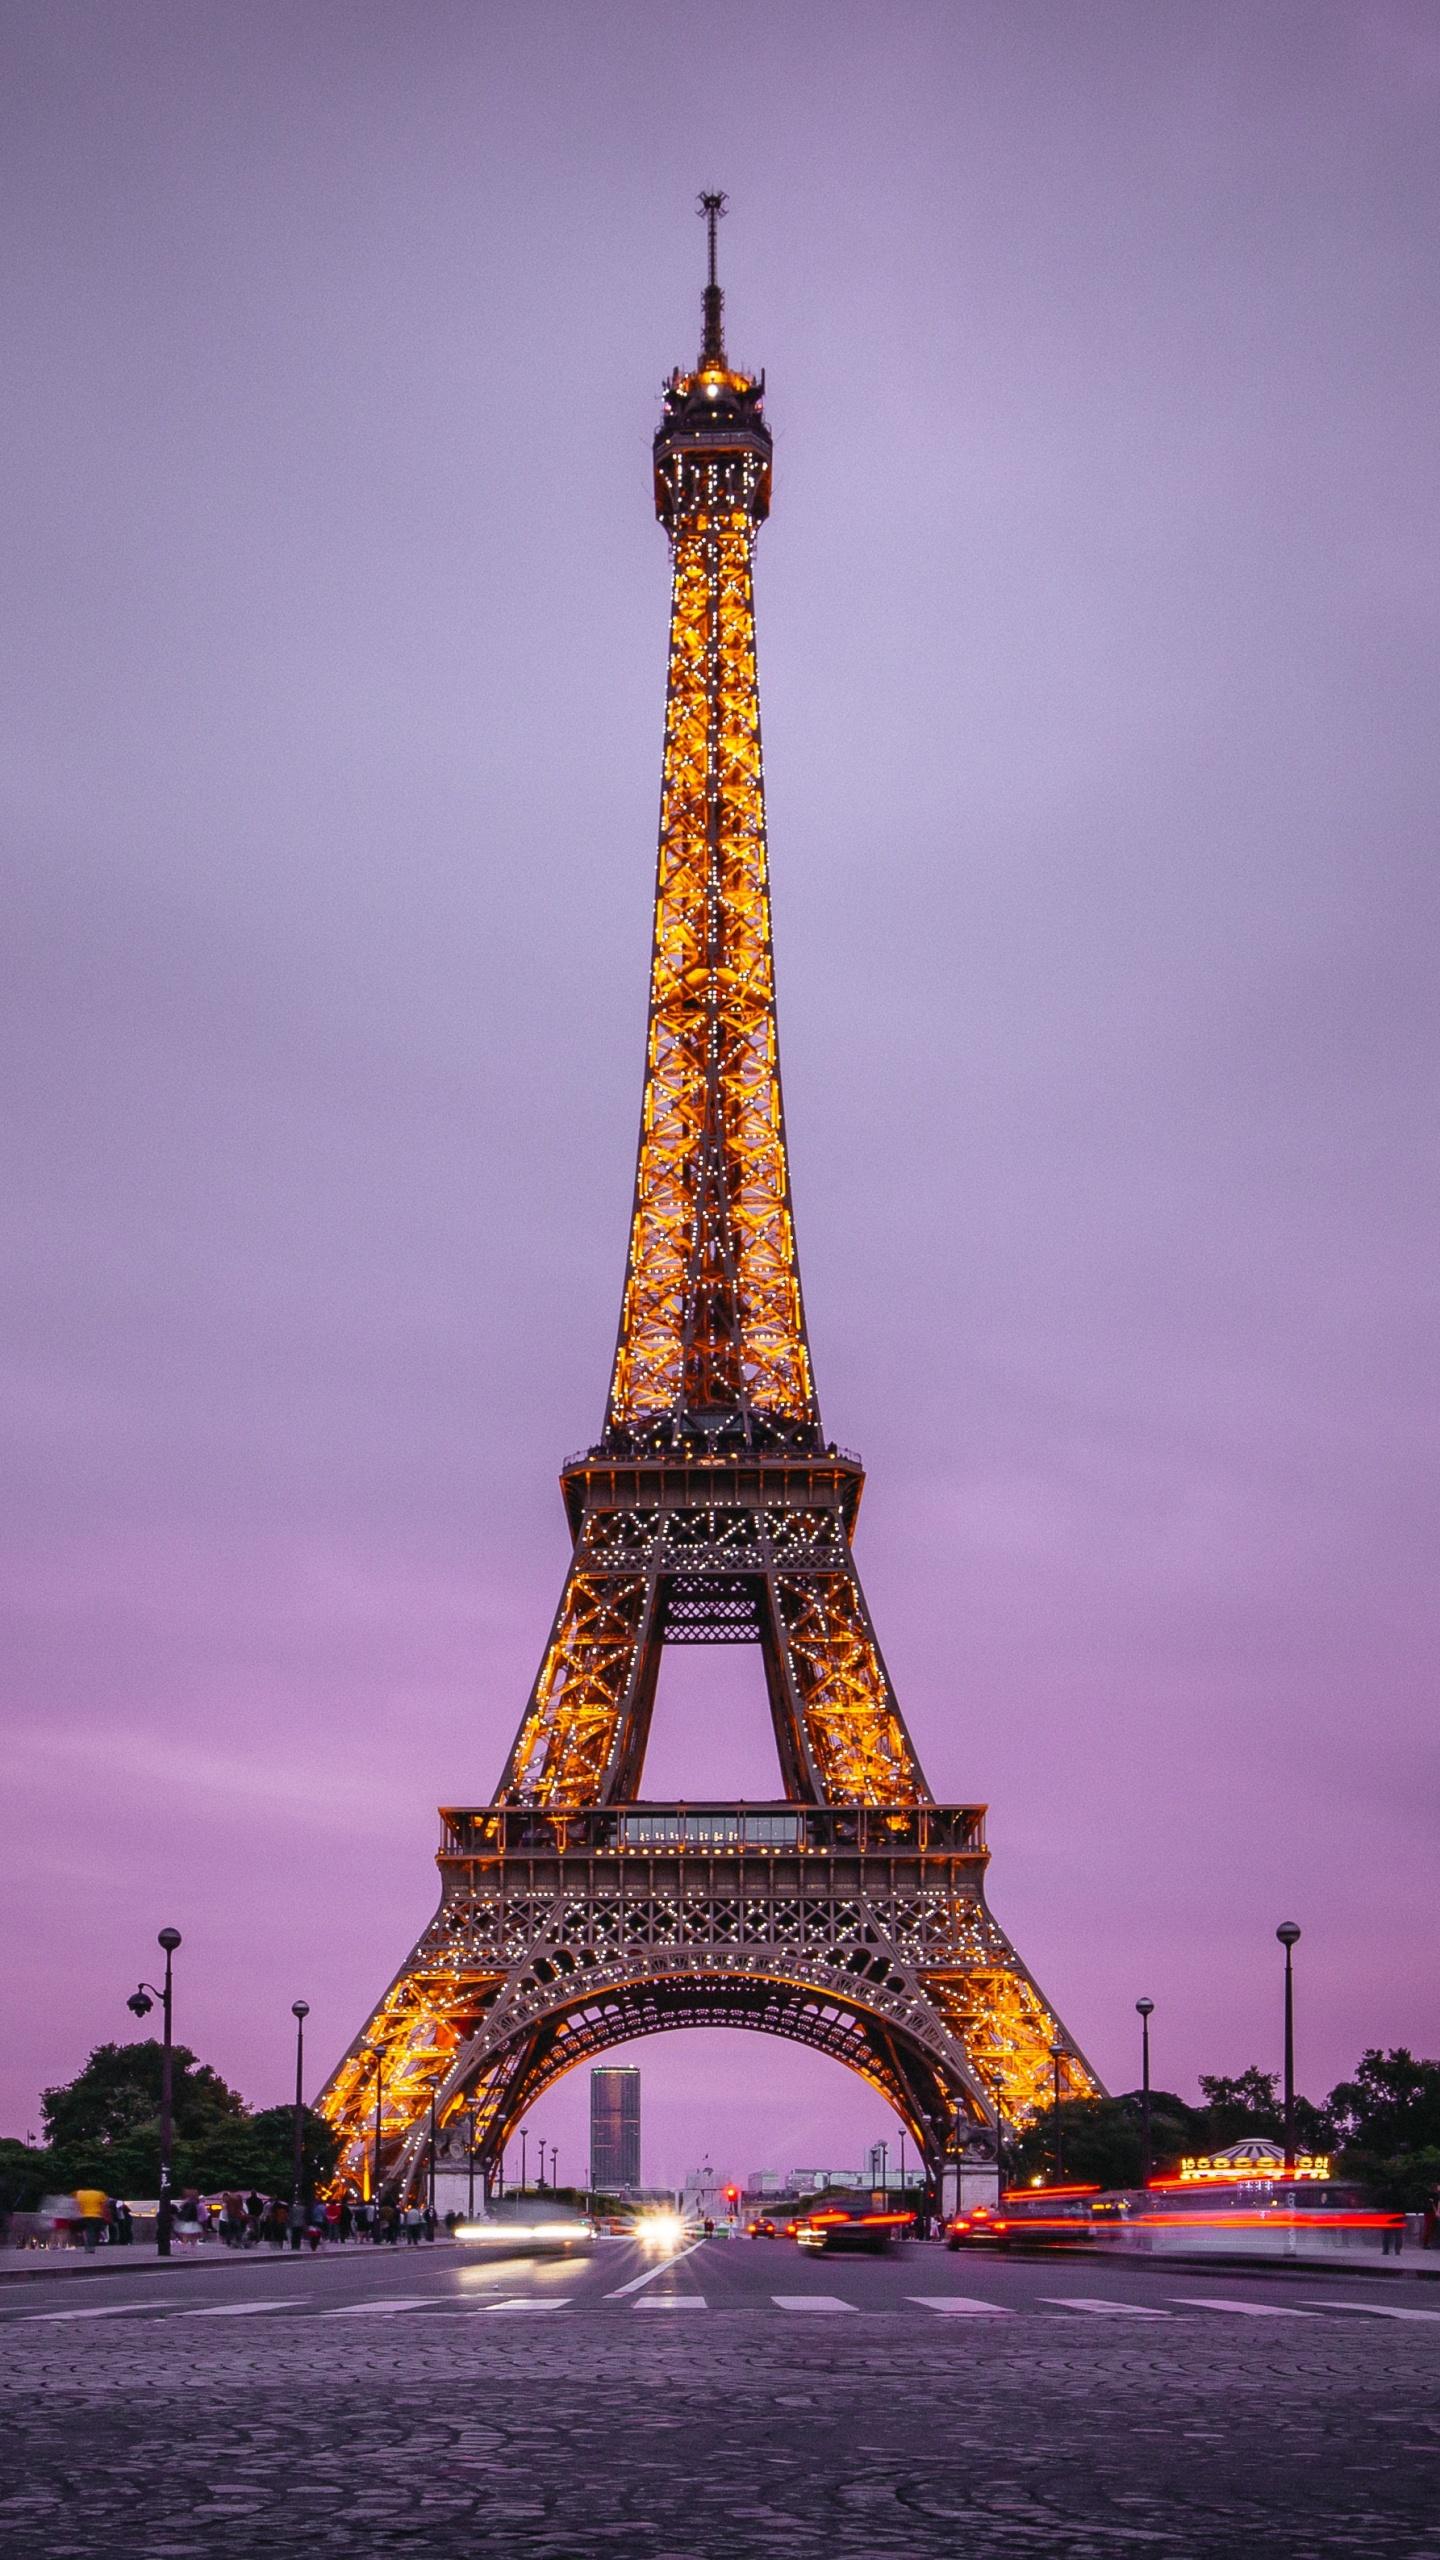 Eiffel Tower 4K Wallpaper Paris France Evening Purple